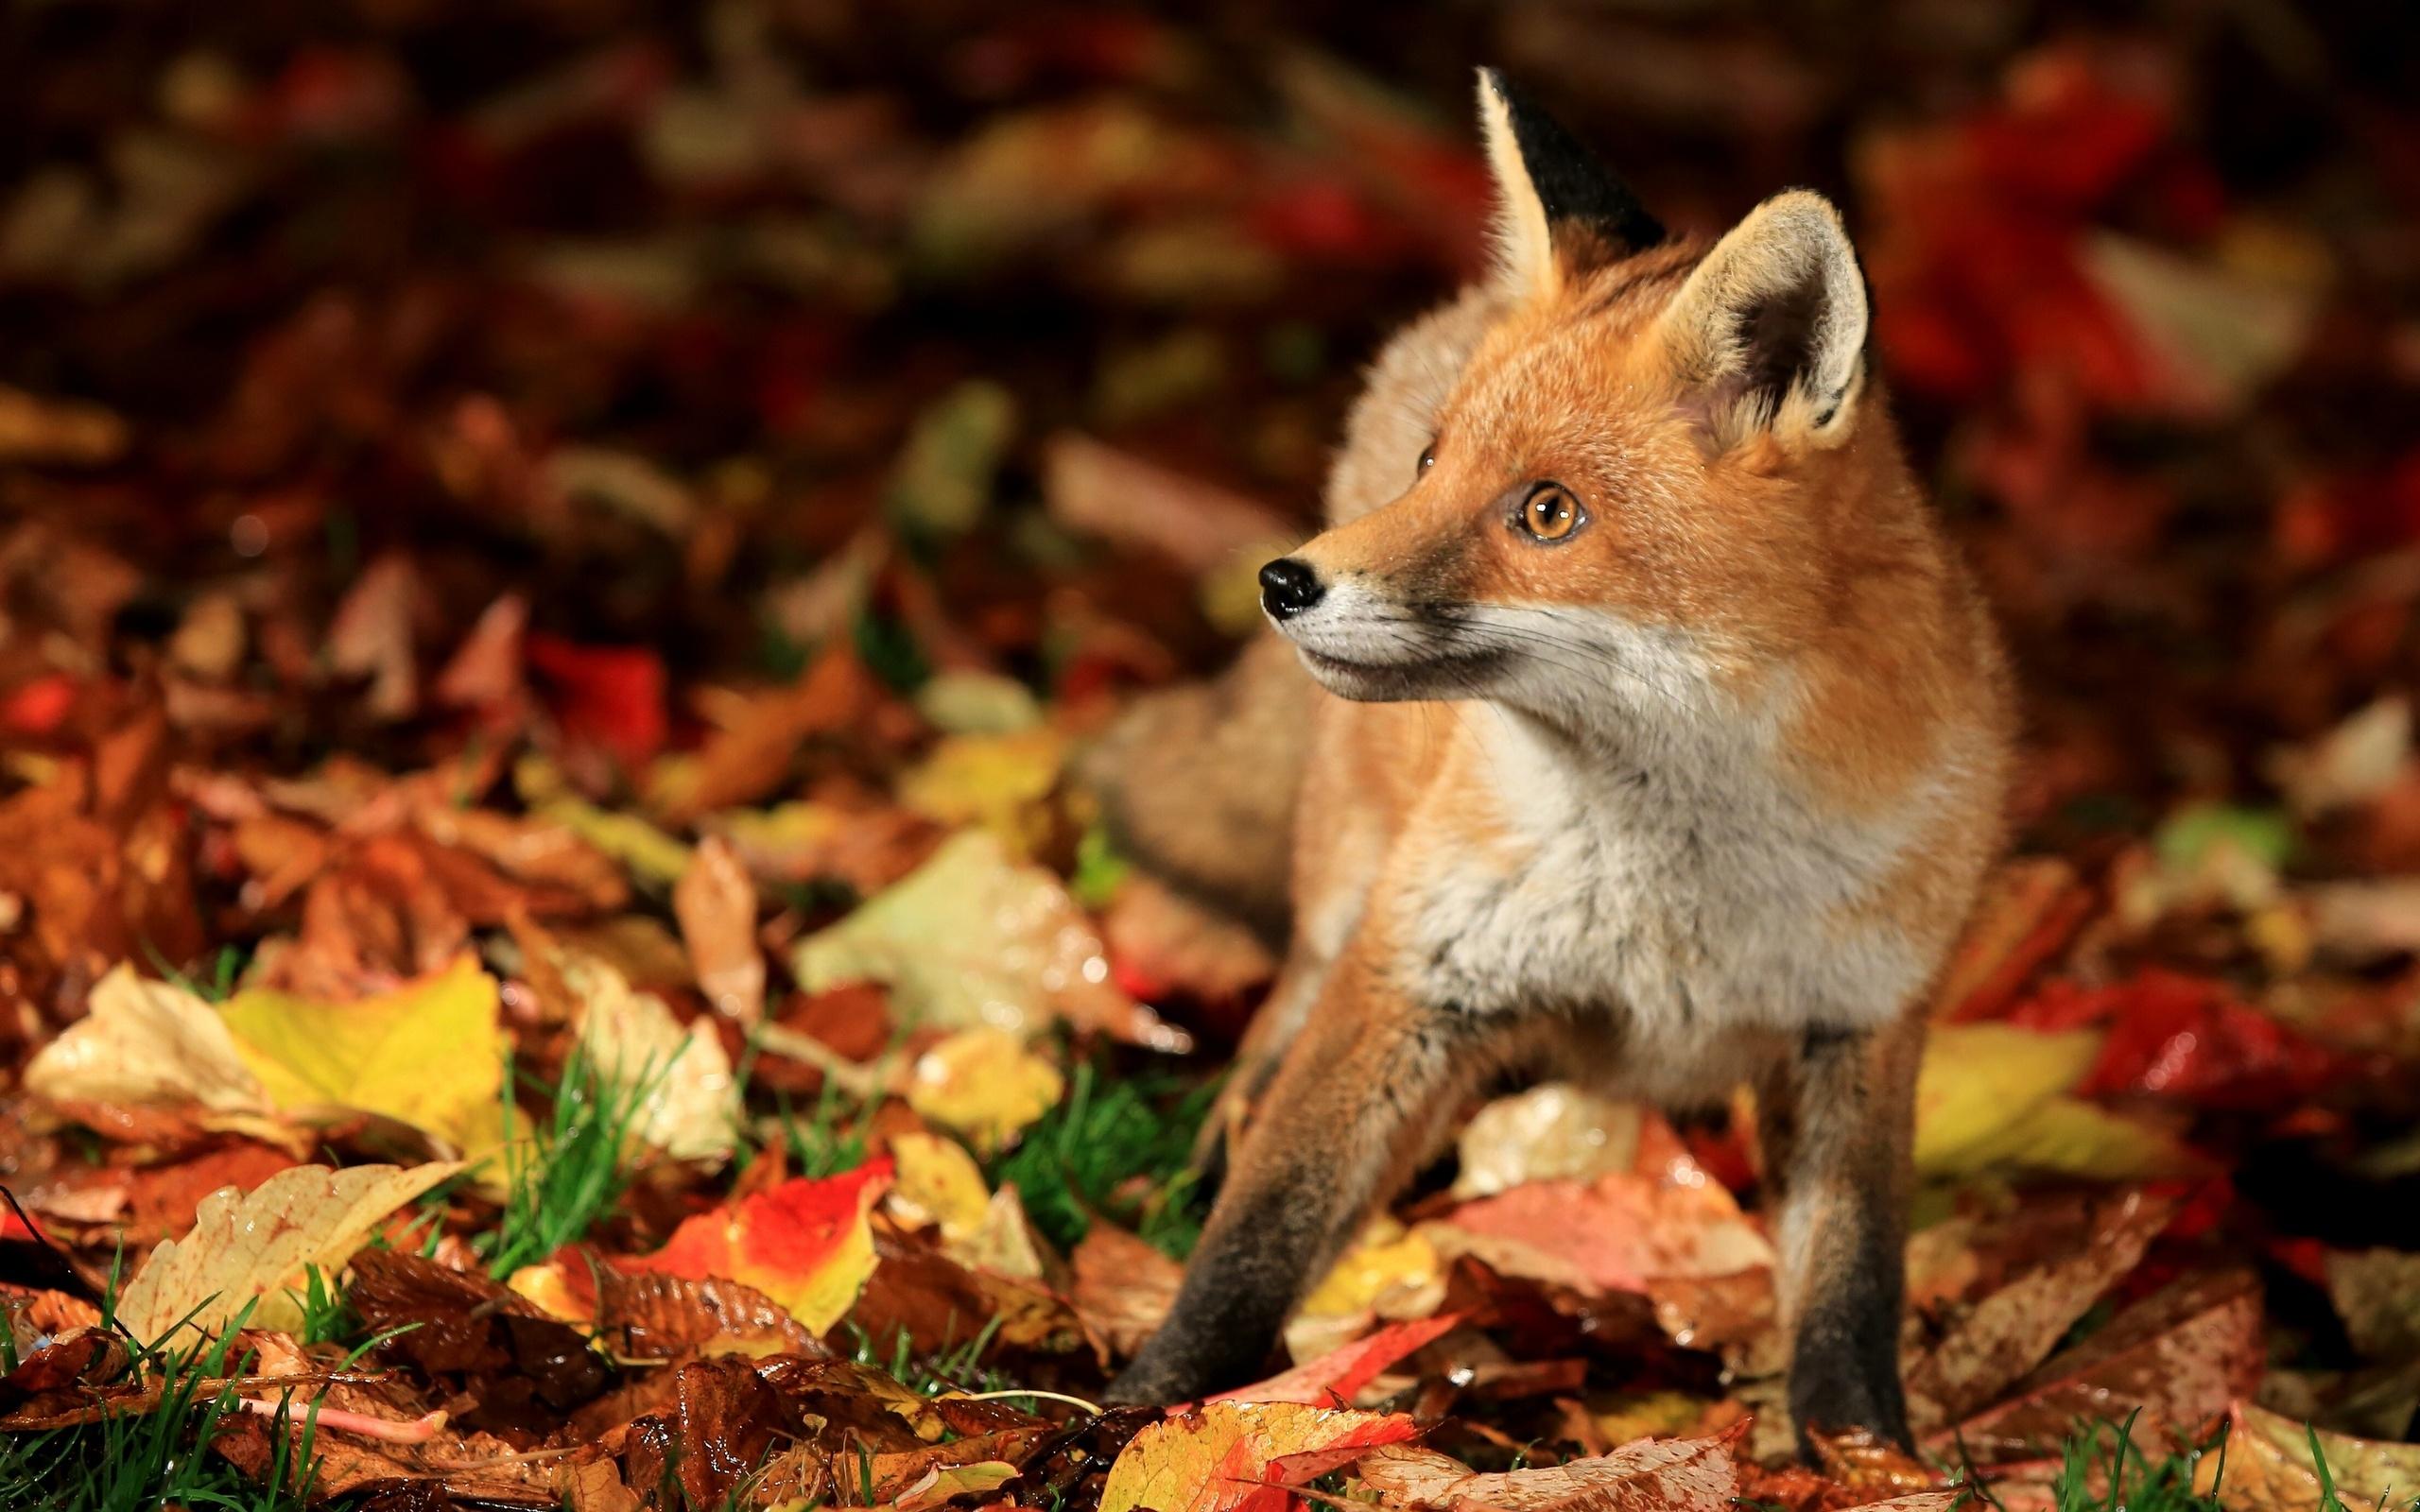 Fox full hd wallpaper and background image 2560x1600 - Fox desktop background ...